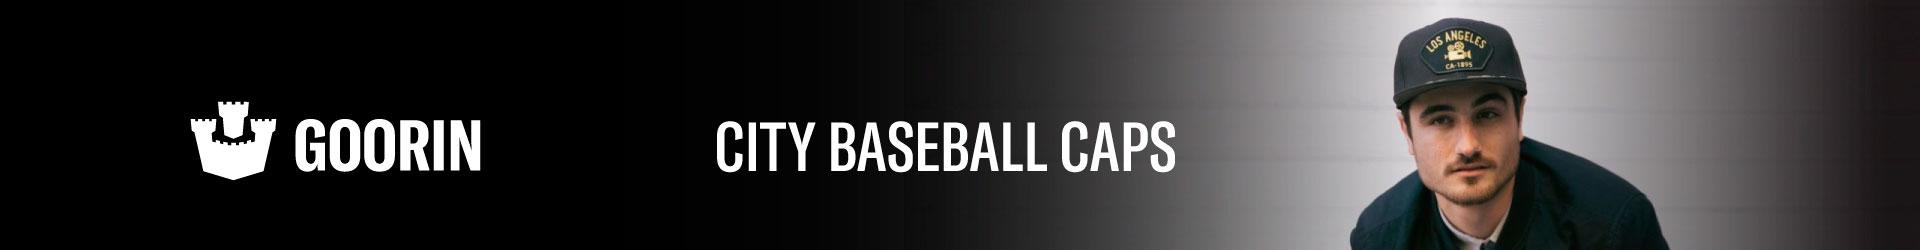 Goorin City Baseball Caps